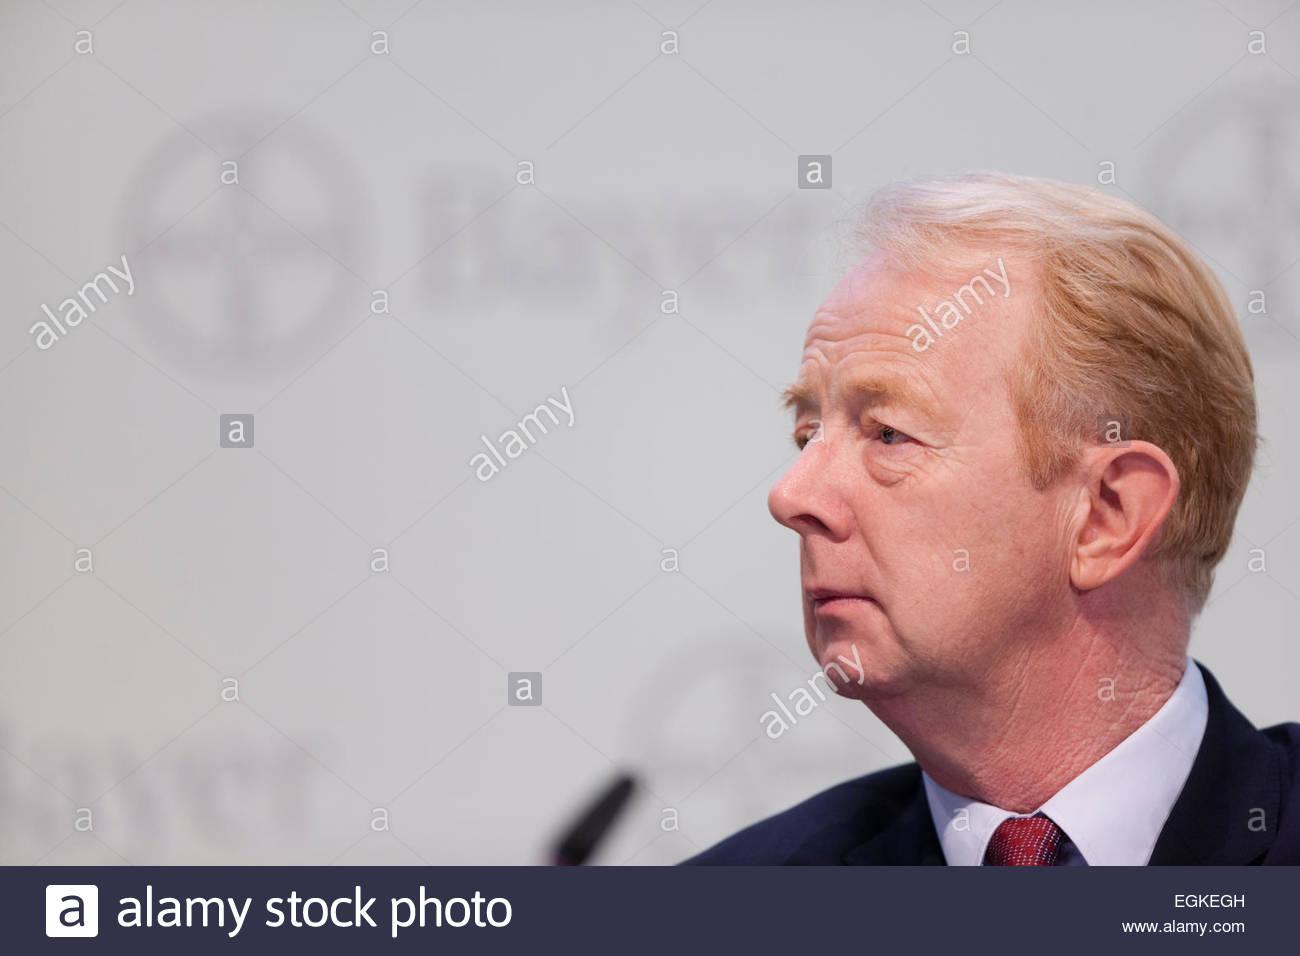 Marijn Emmanuel Johannes Dekkers, CEO of Bayer AG, a german chemical and pharmaceutical company Stock Photo